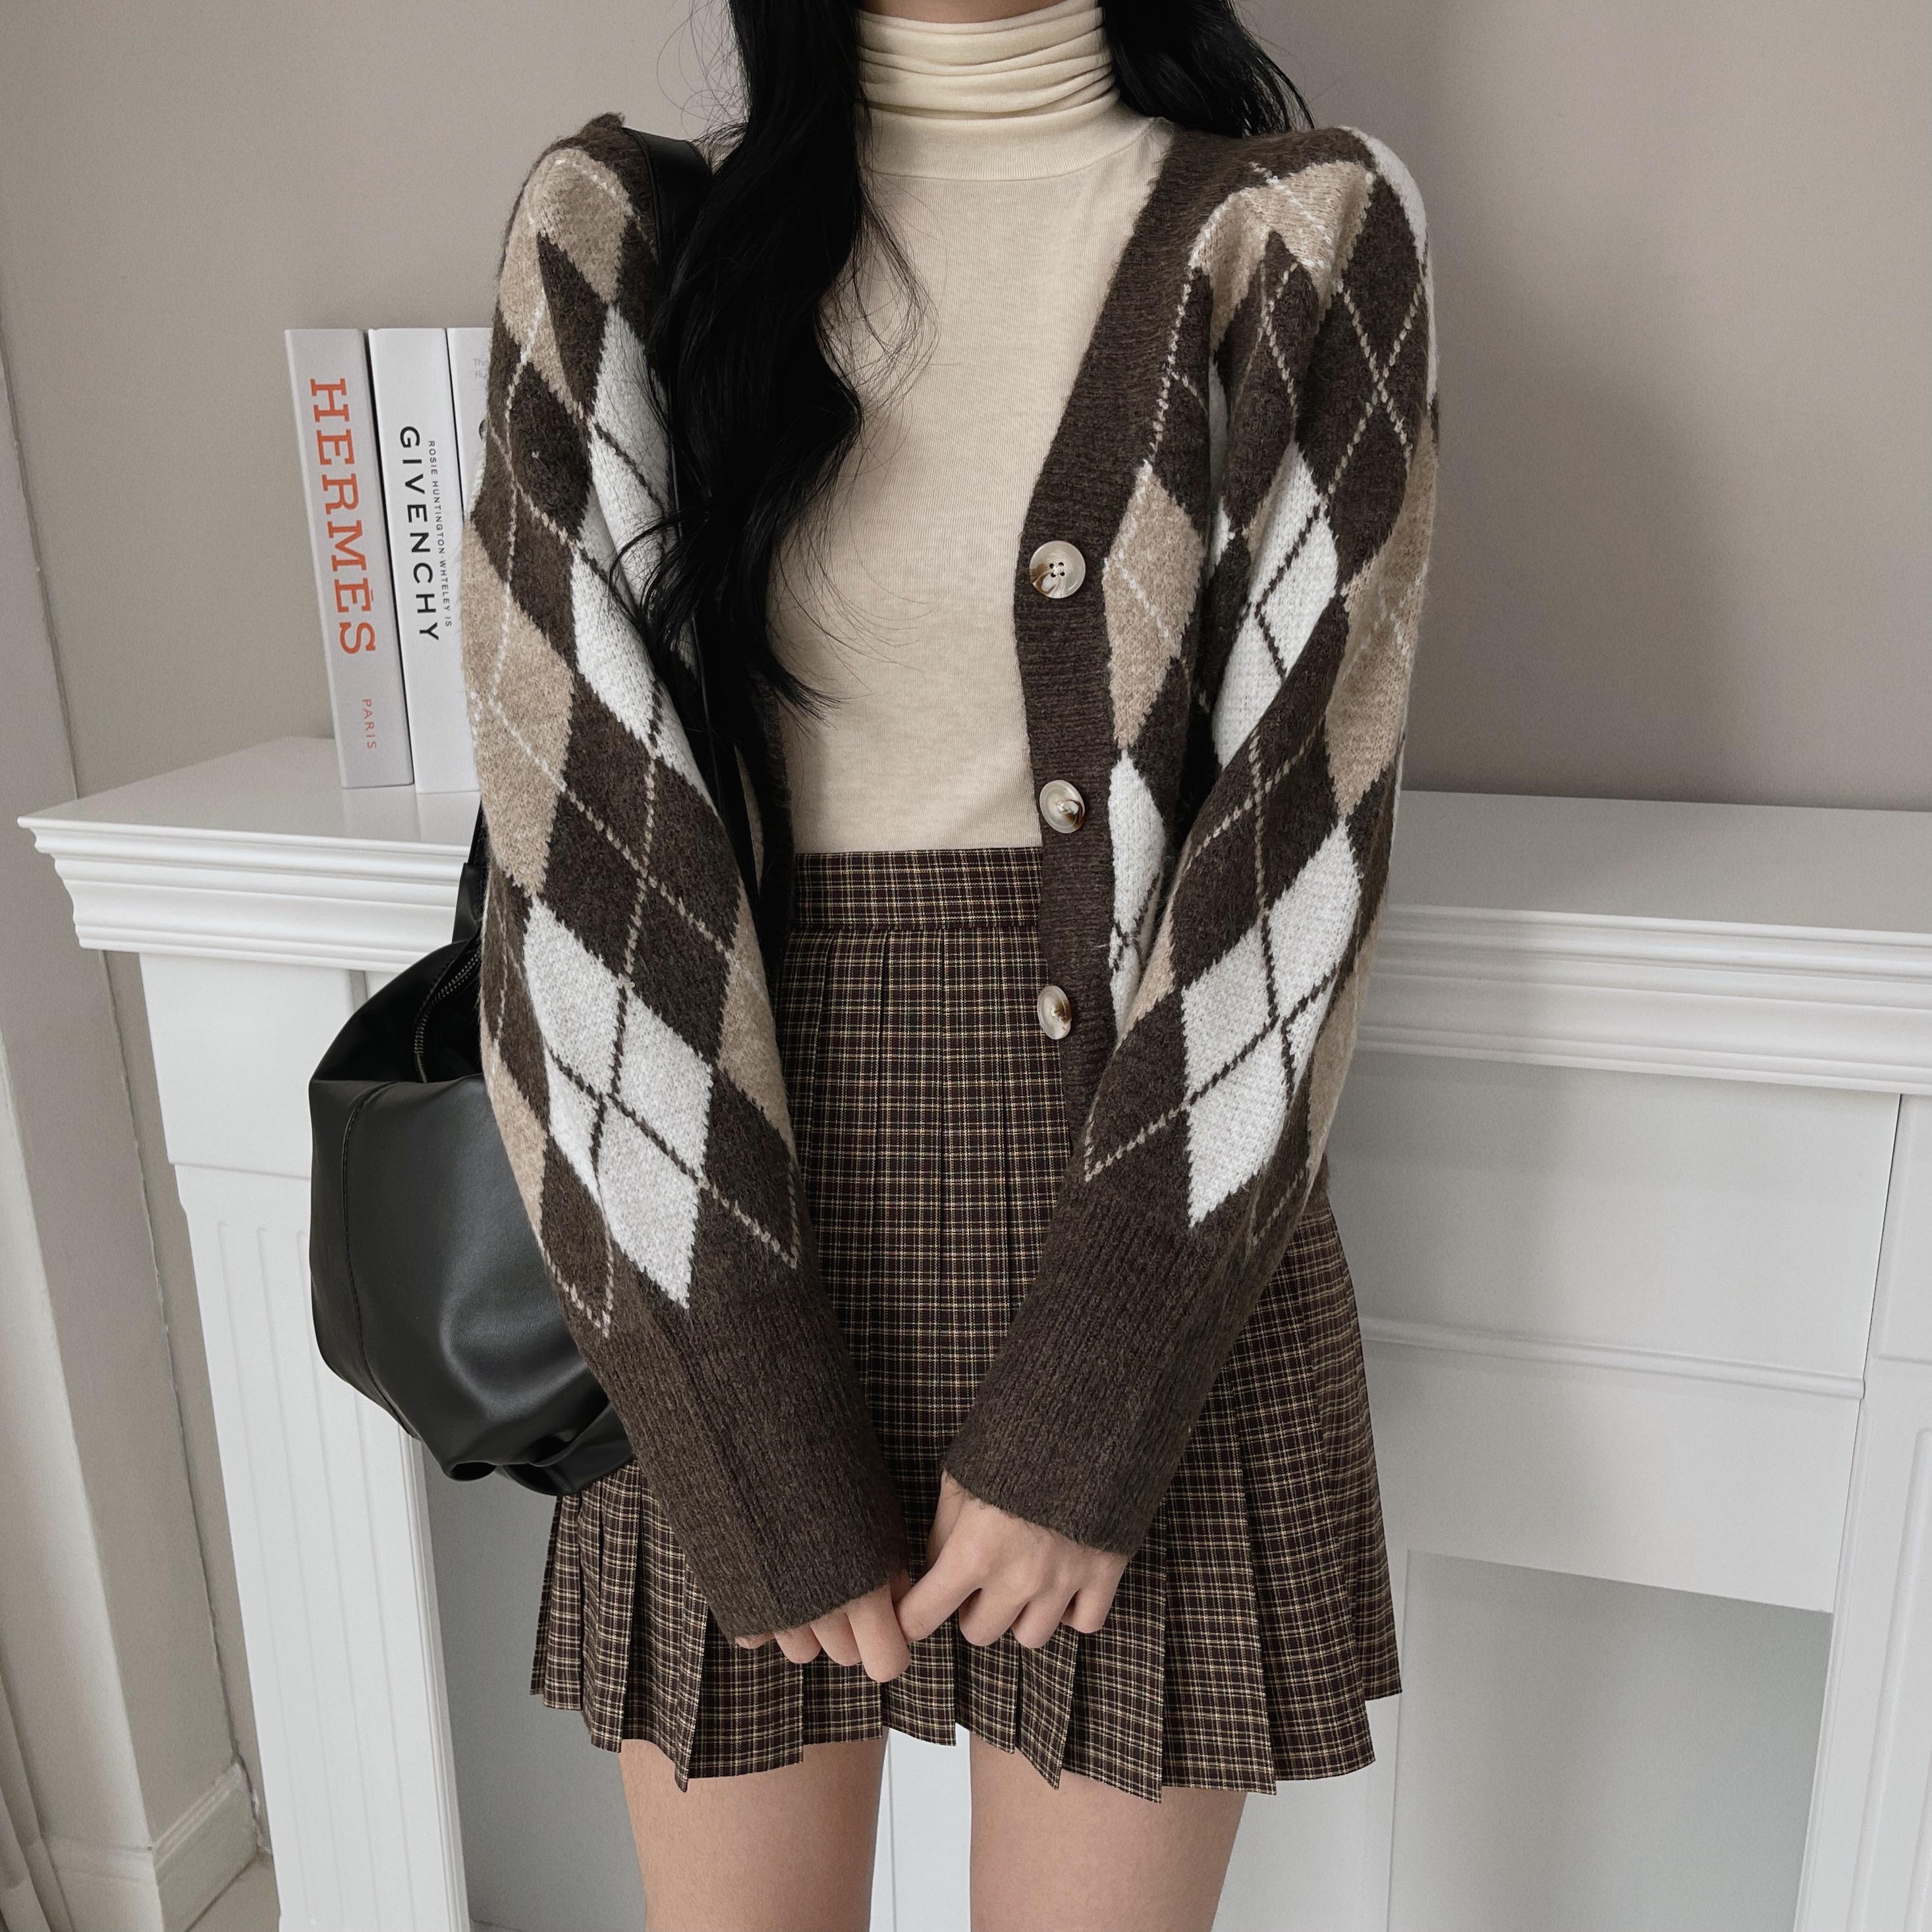 Classic Argyle Knitwear V-Neck Cardigan